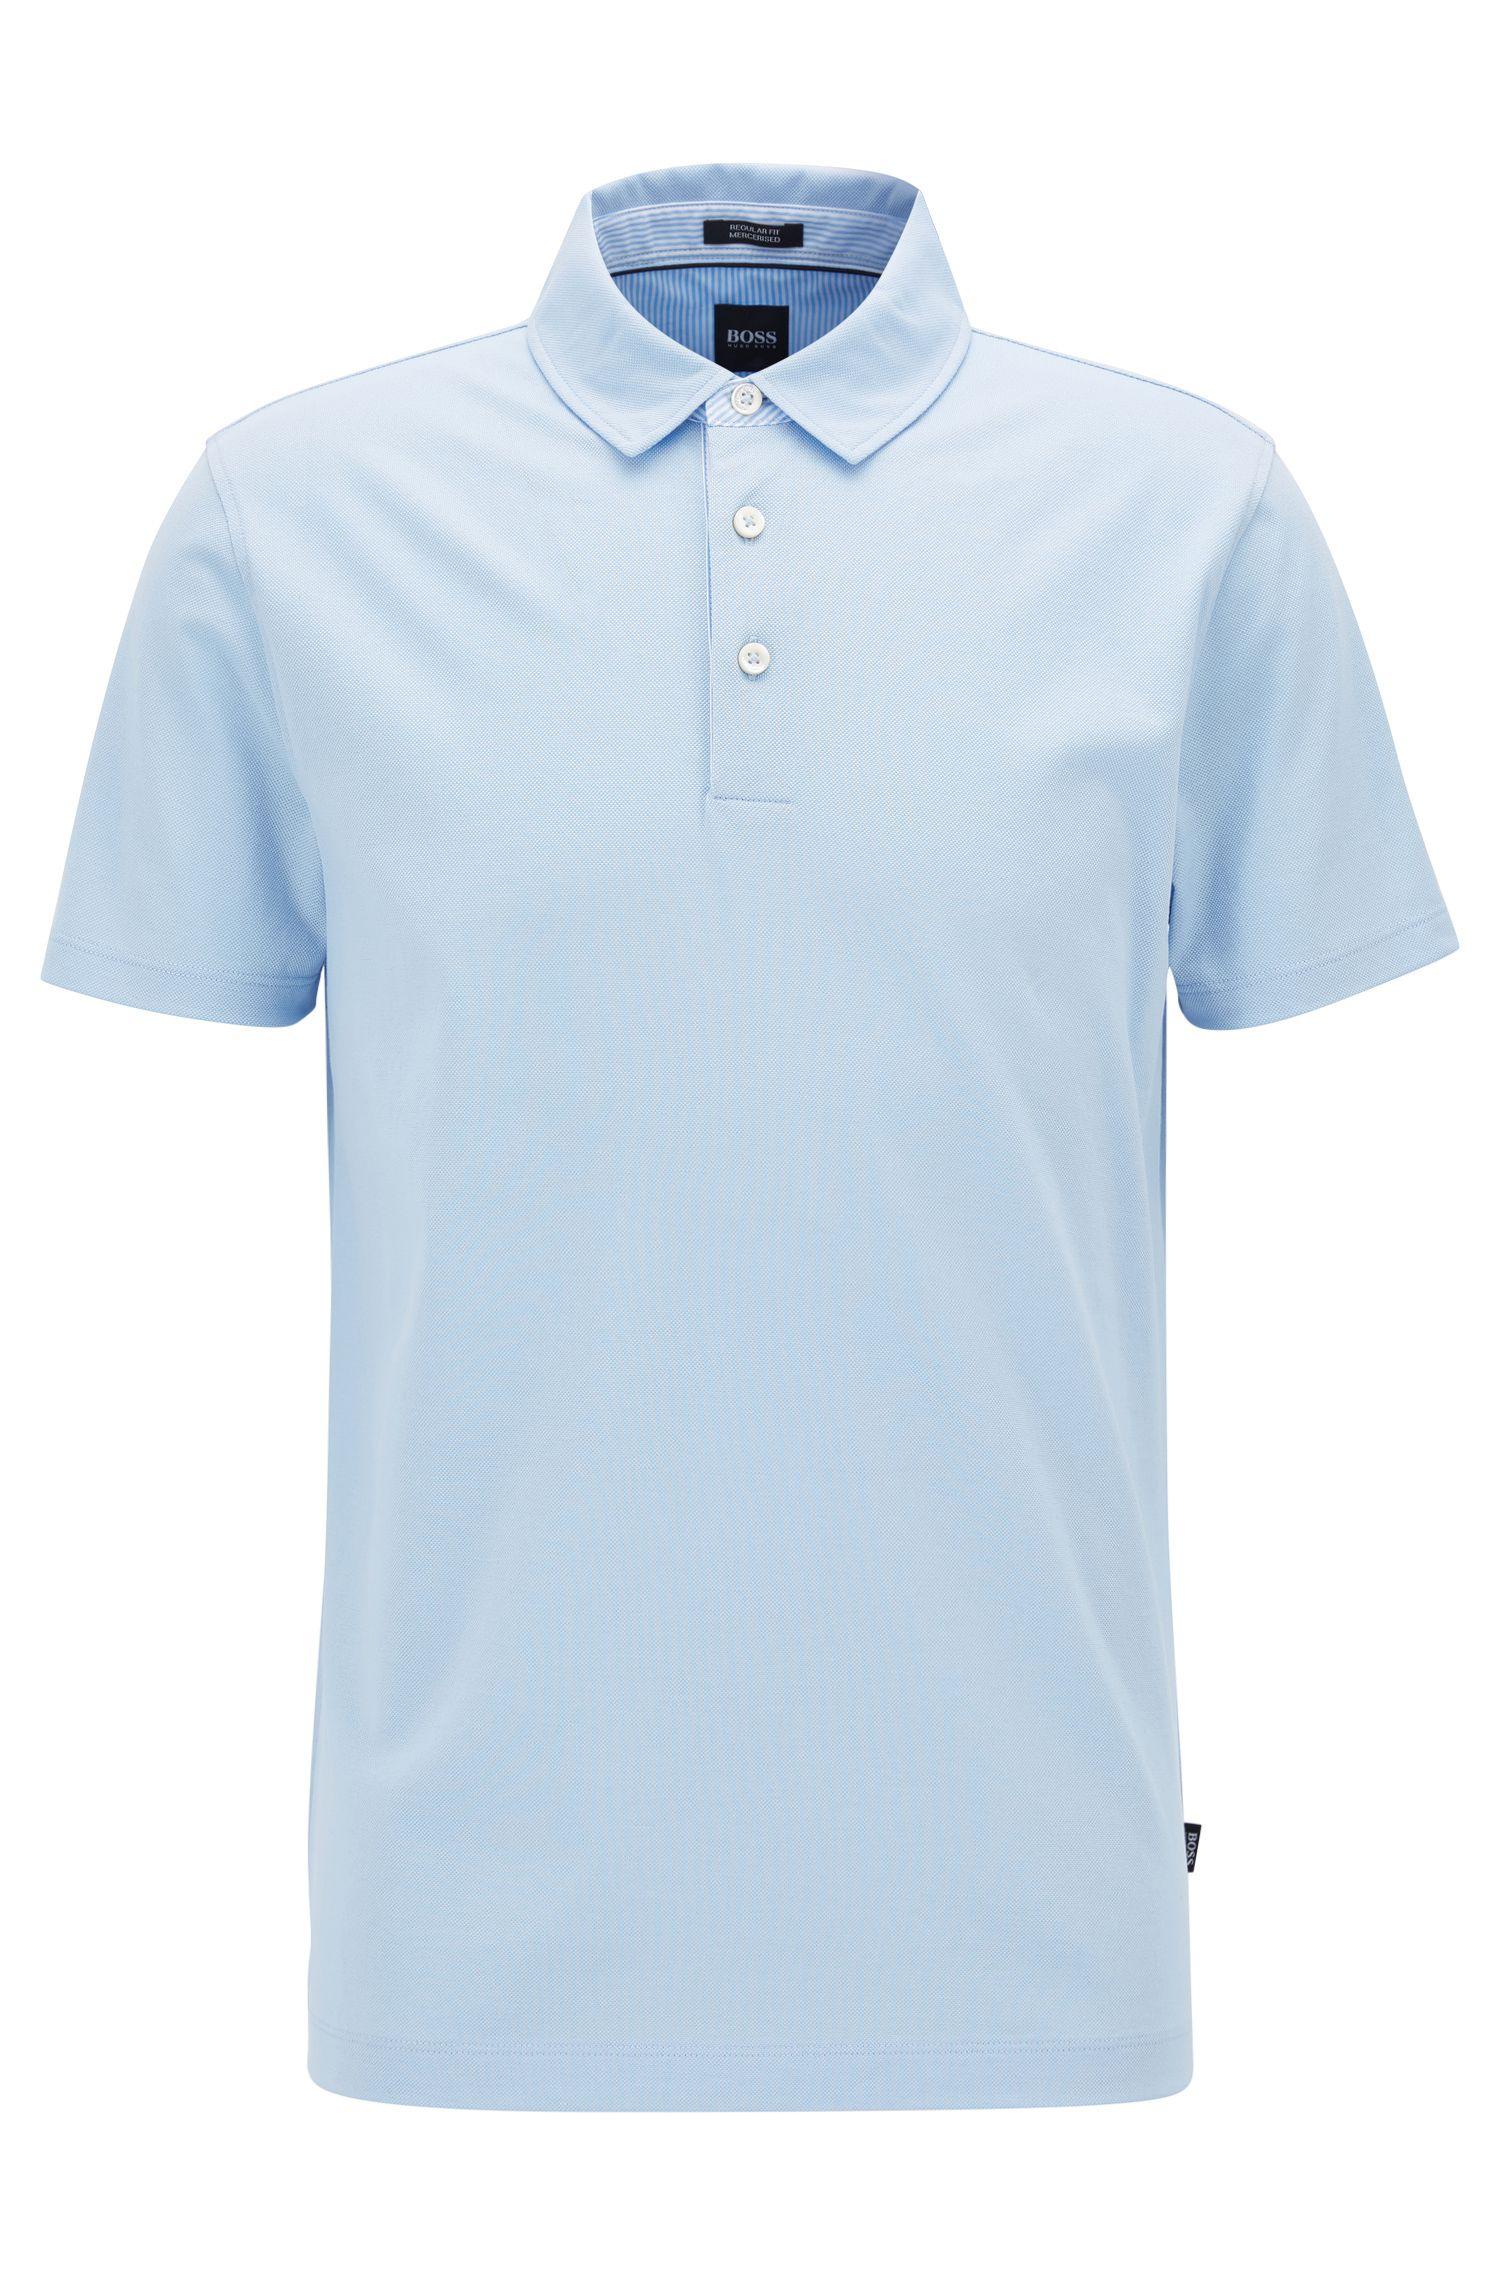 Poloshirt aus merzerisiertem Baumwoll-Piqué